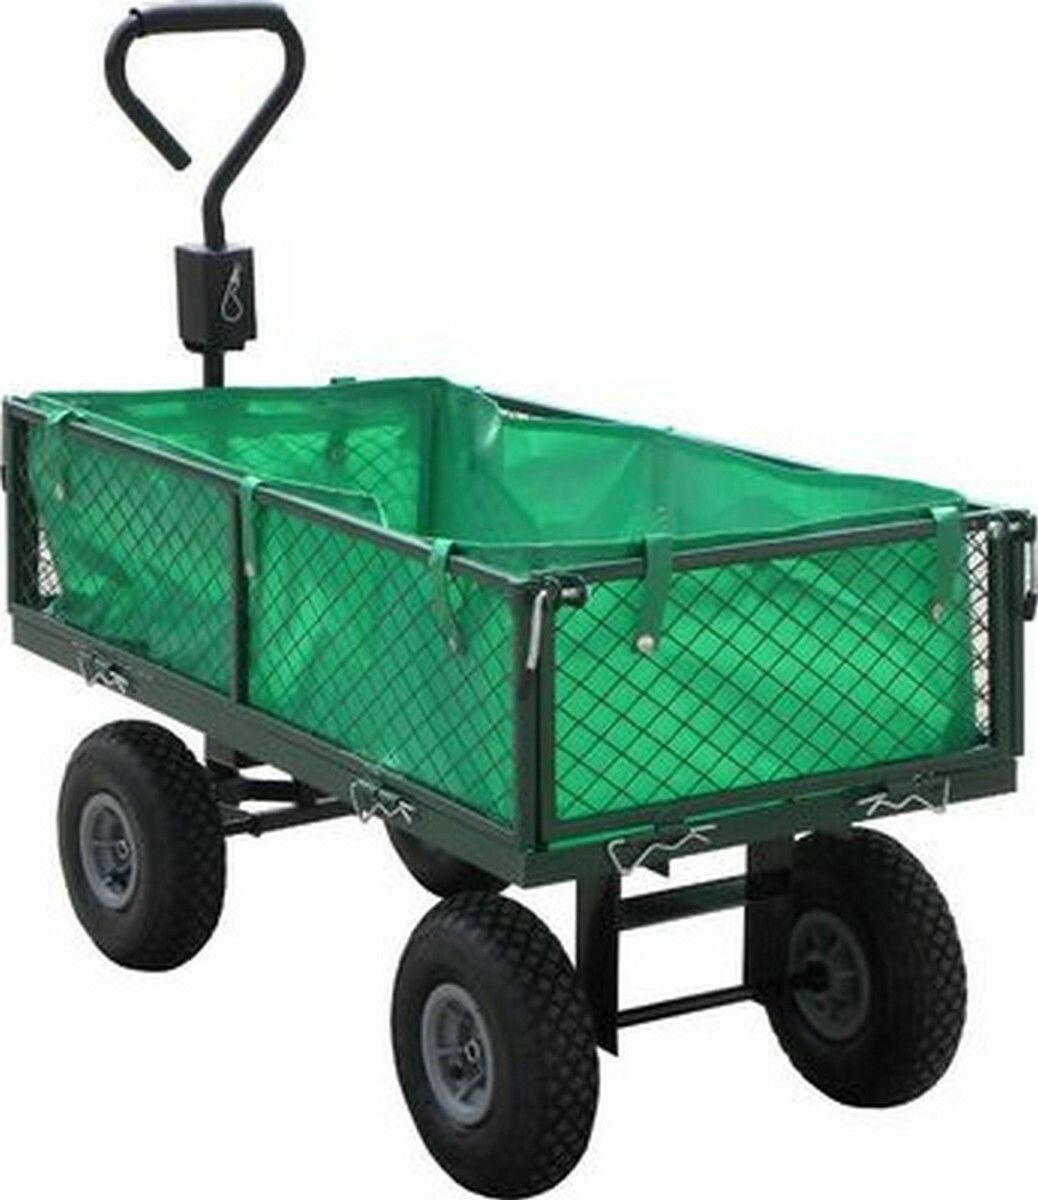 Zahradní vozík, nosnost 350kg GEKO